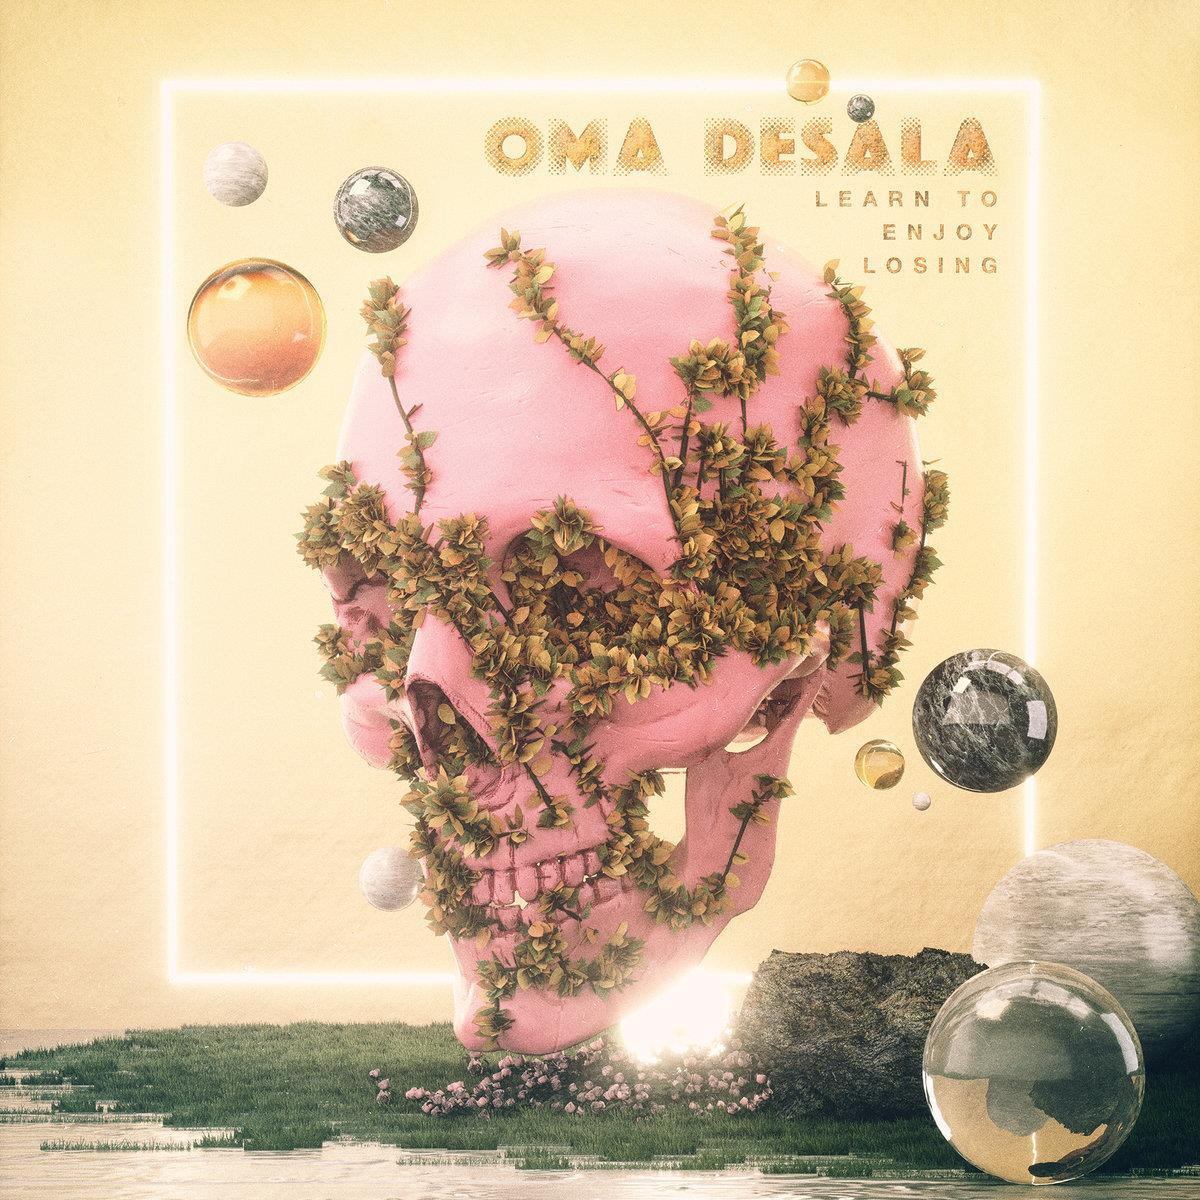 Oma Desala – Learn To Enjoy Losing [LP]